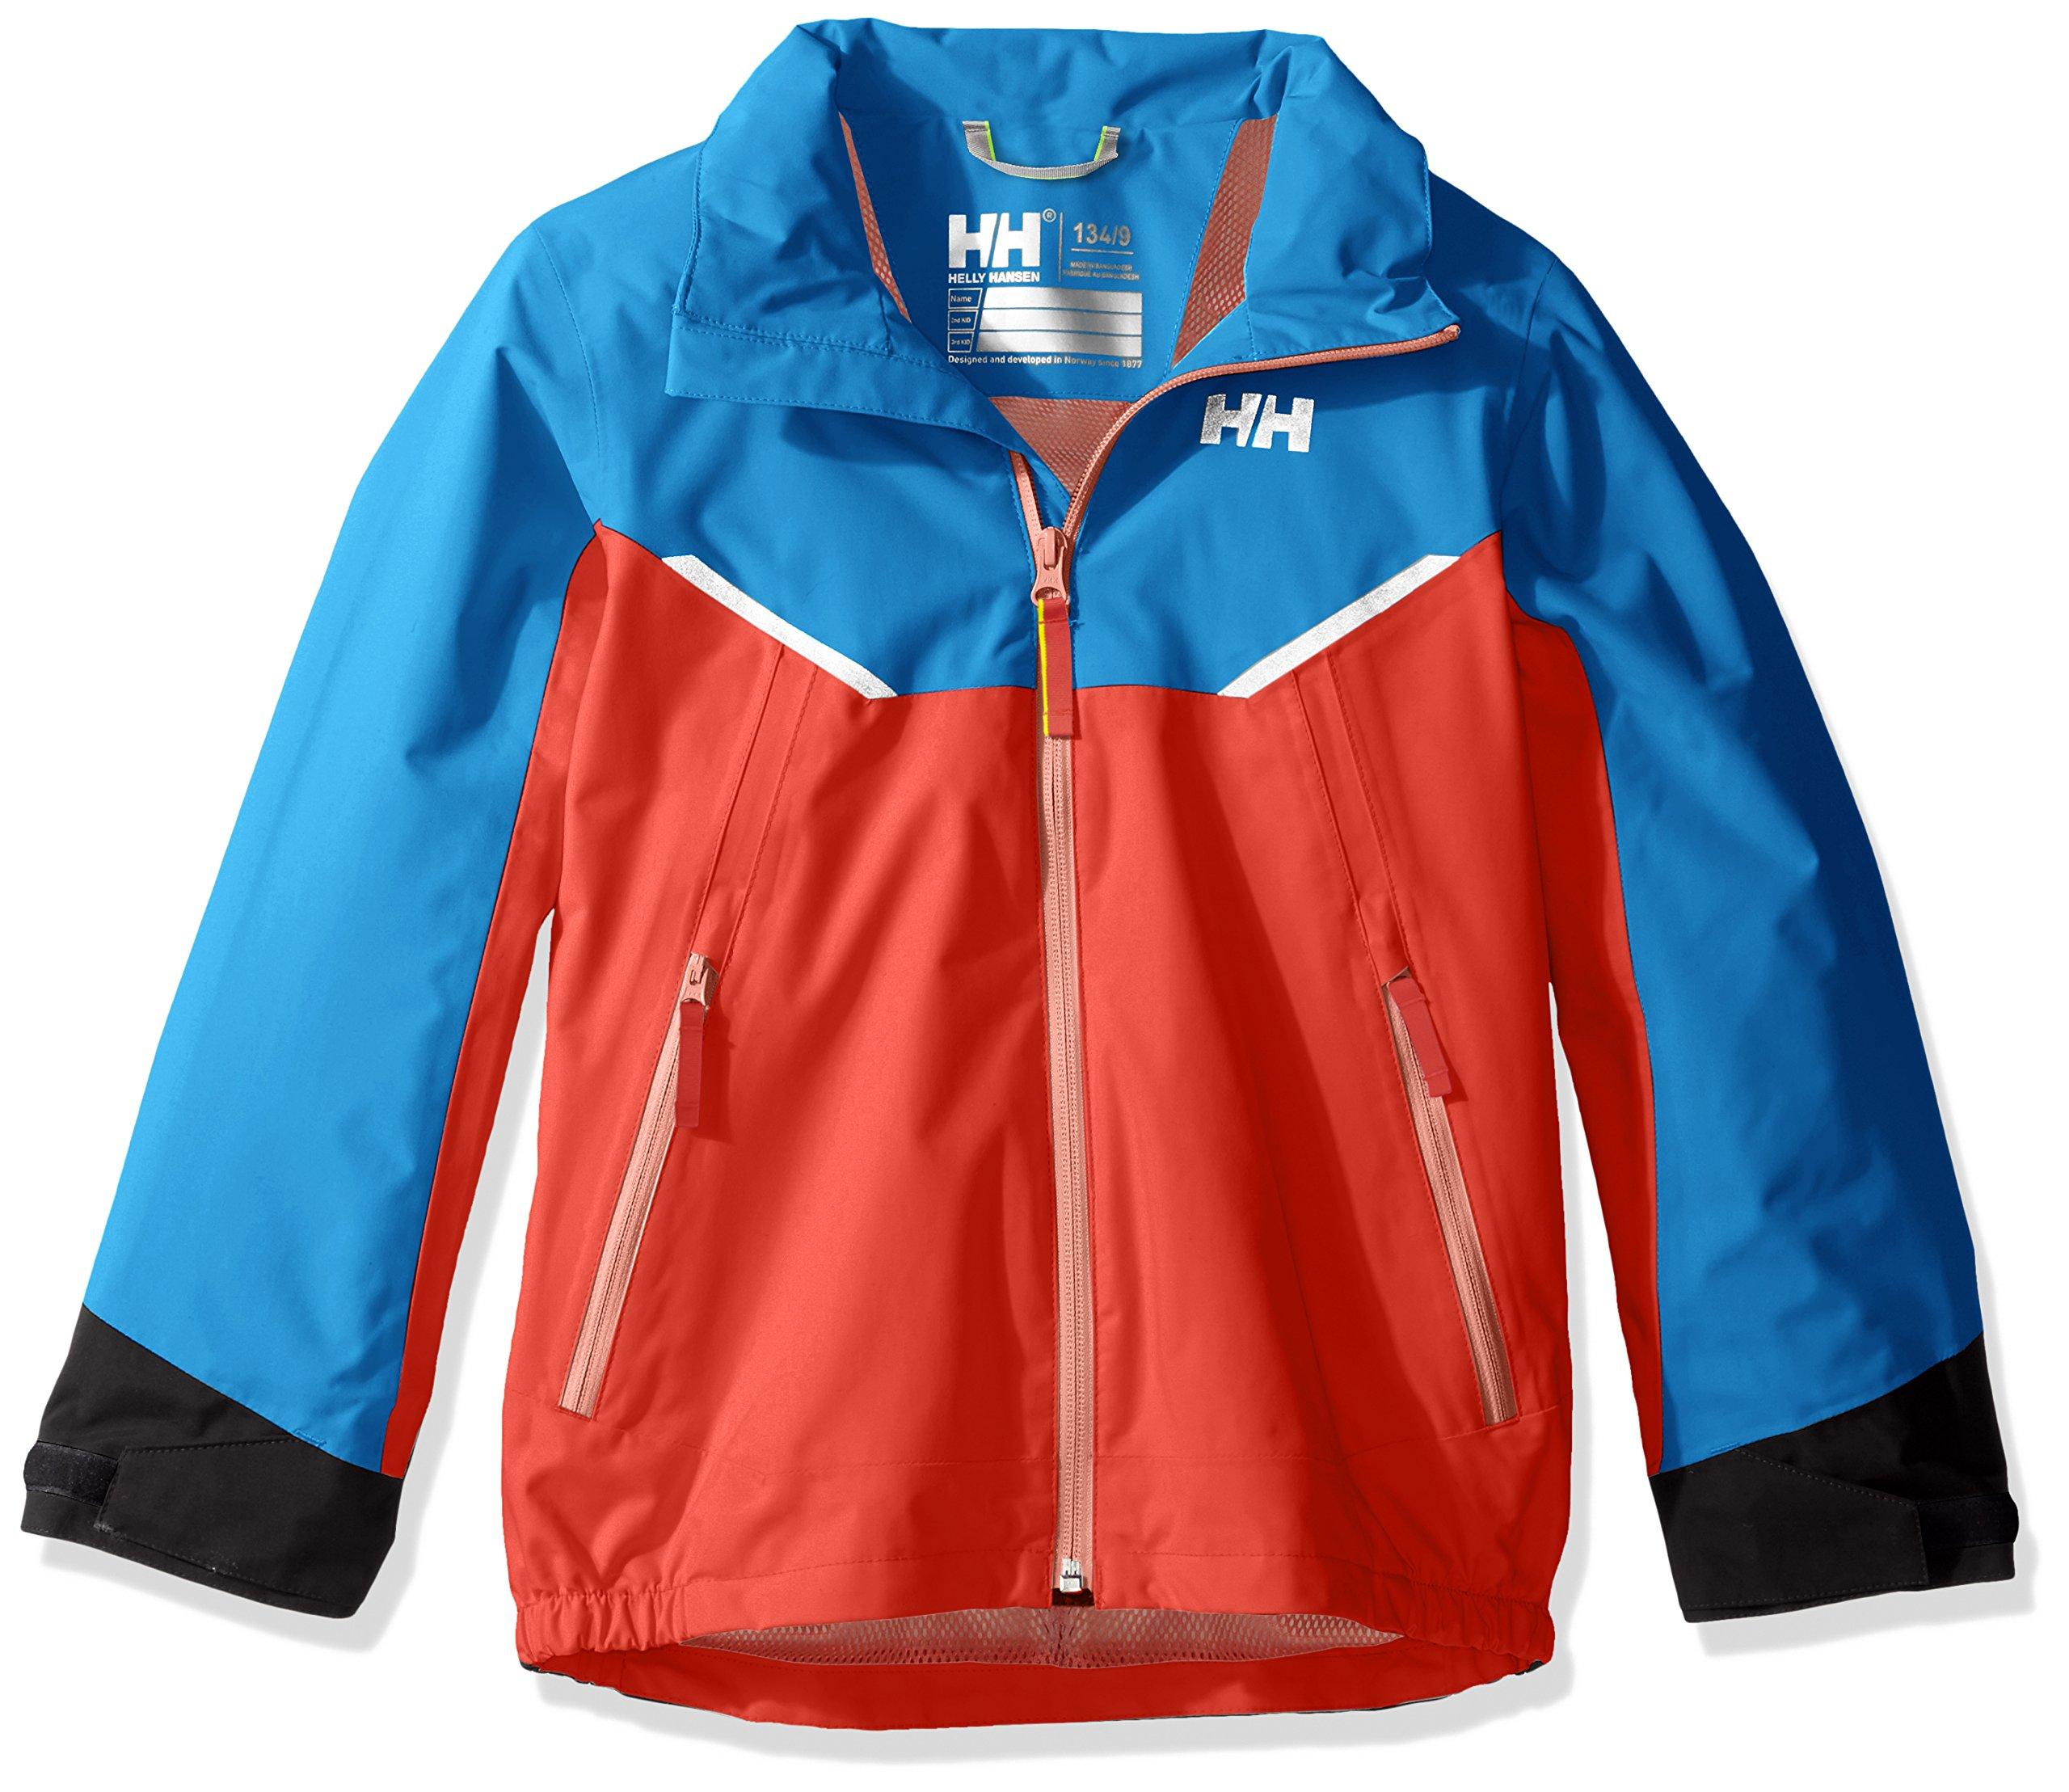 Helly Hansen Kids Shelter Waterproof Rain Jacket Coat, 102 Cayenne, Size 1 by Helly Hansen (Image #3)